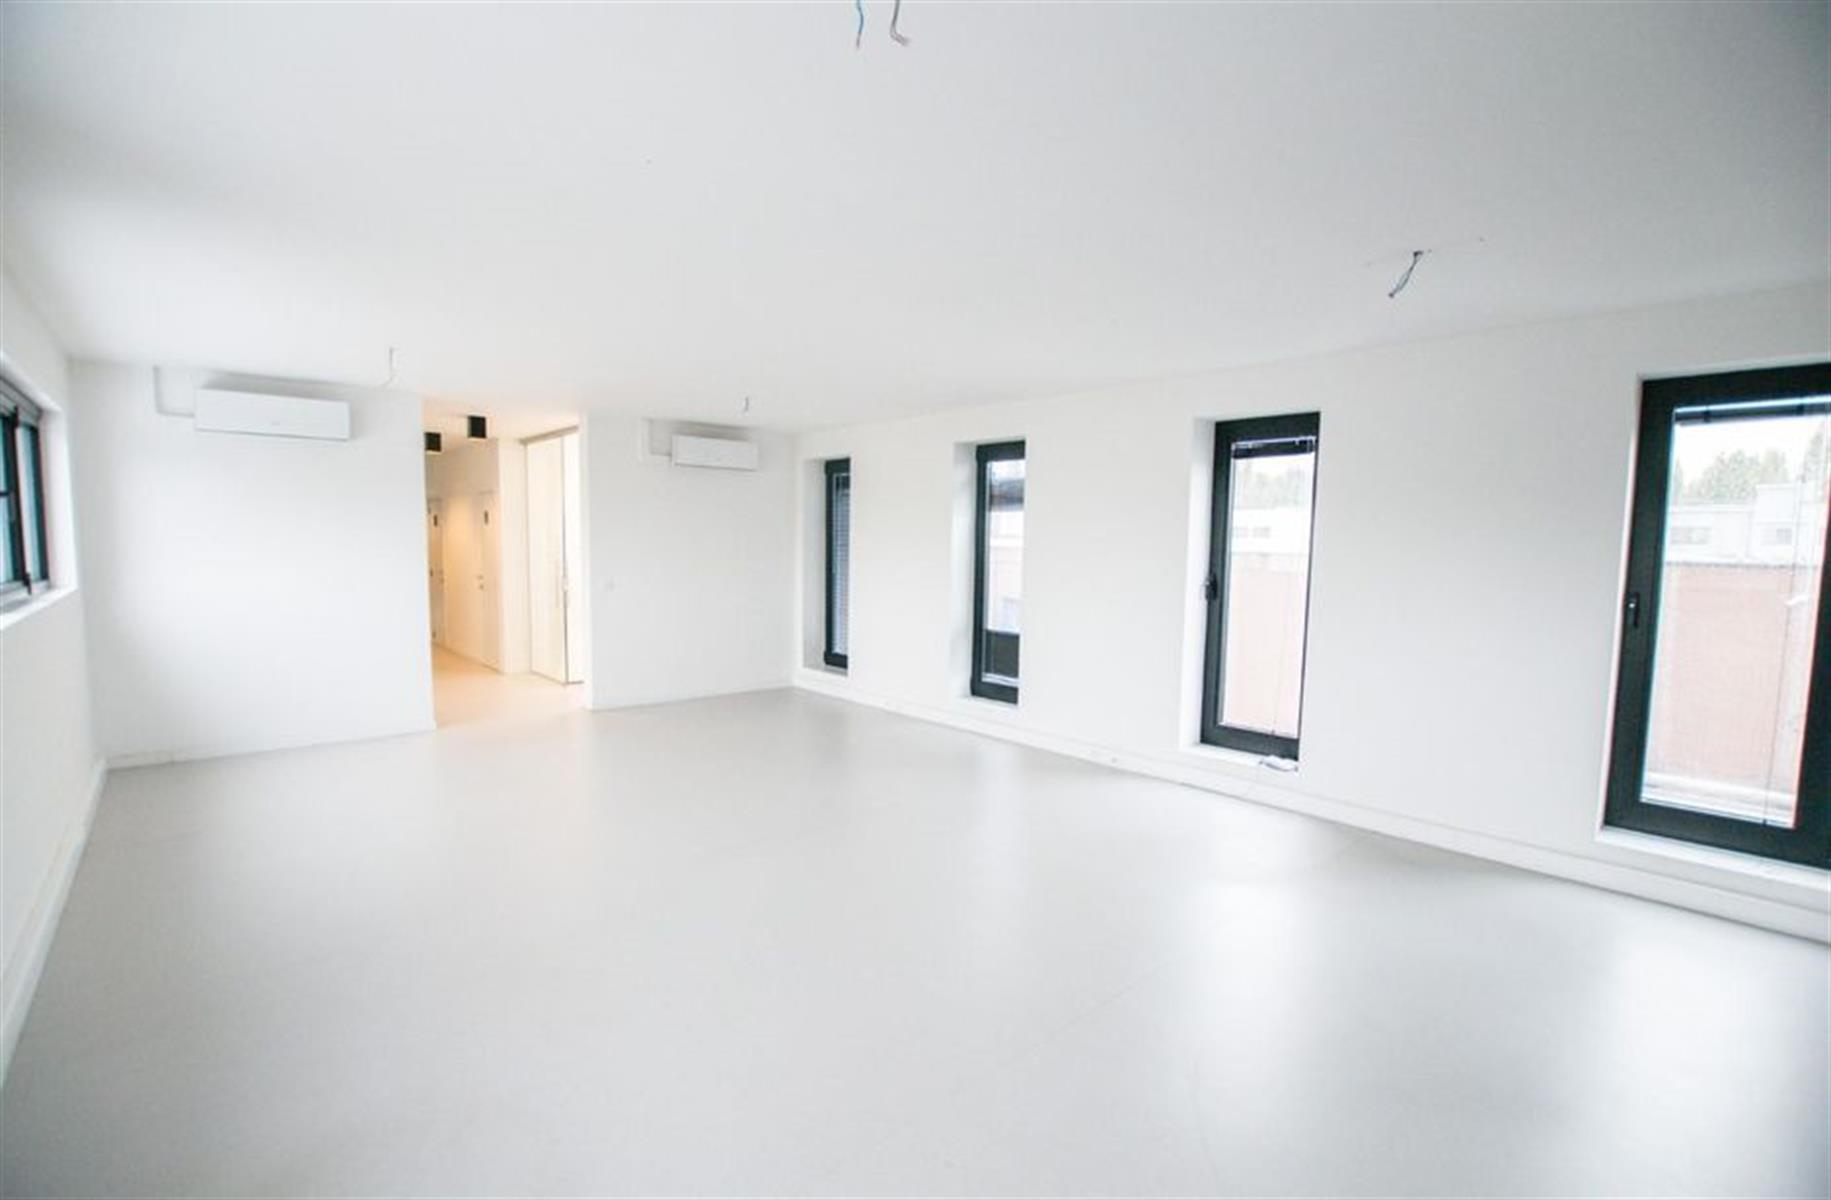 kantoor te huur K003 - Middelmolenlaan 96, 2100 Antwerpen Deurne, België 1